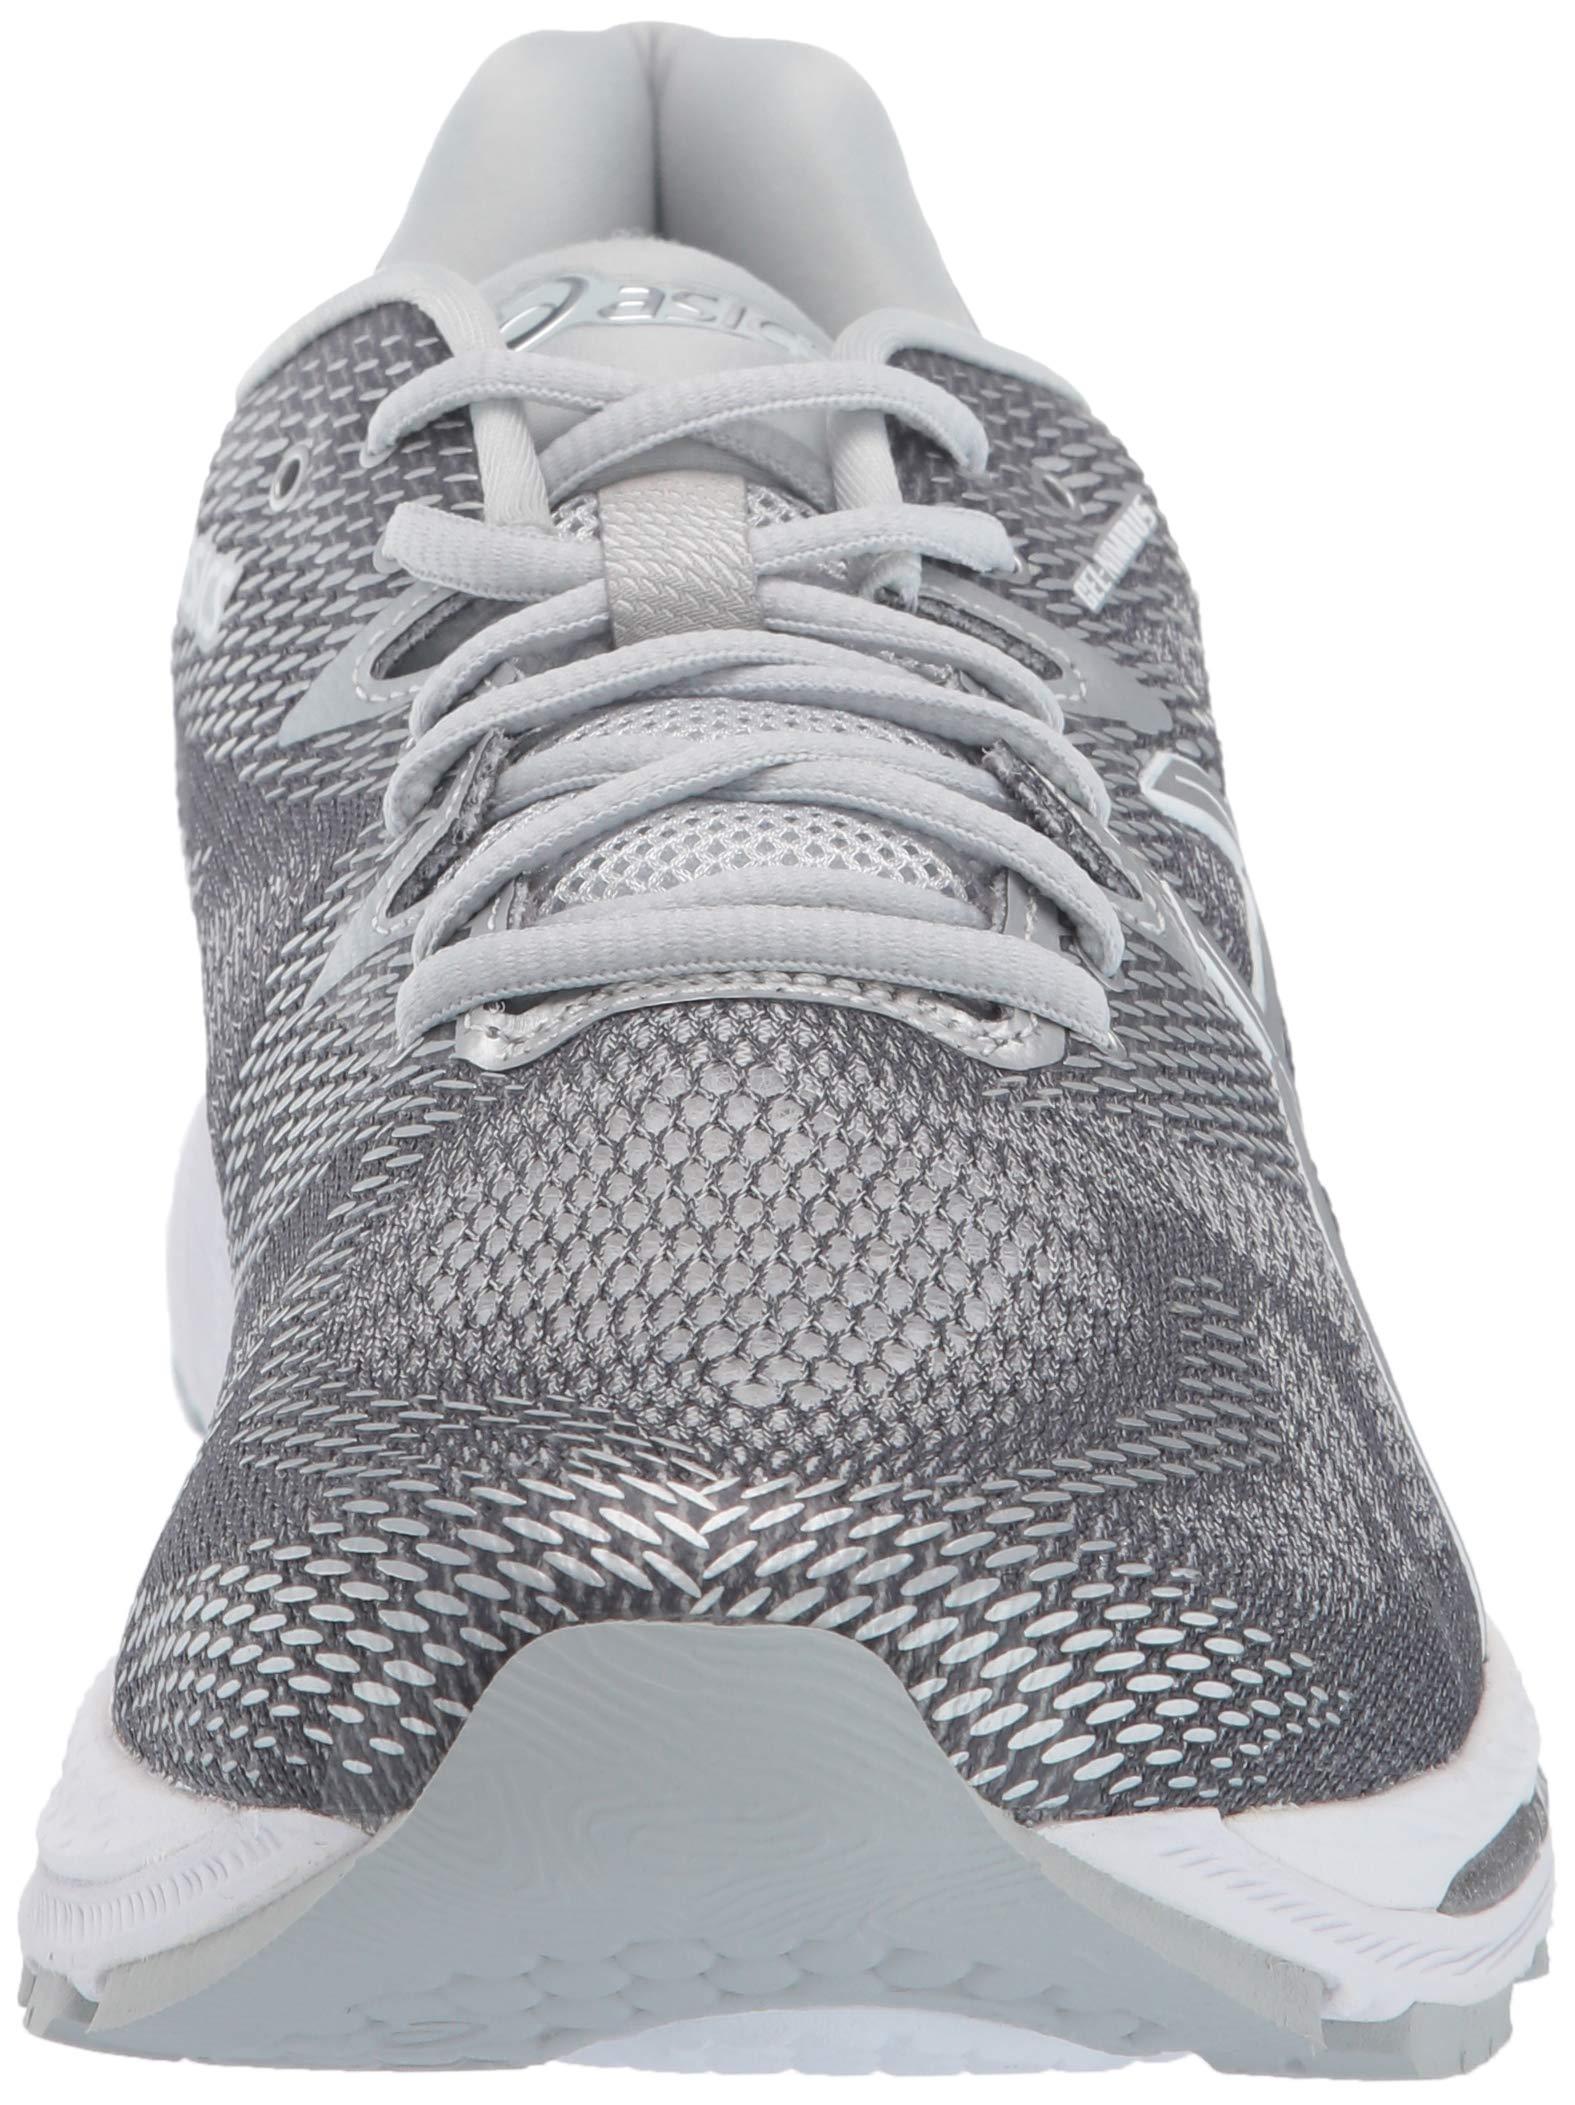 ASICS Mens Fitness/Cross-Training Trail Running Shoe, Carbon/Silver/White, 7 Medium US by ASICS (Image #4)